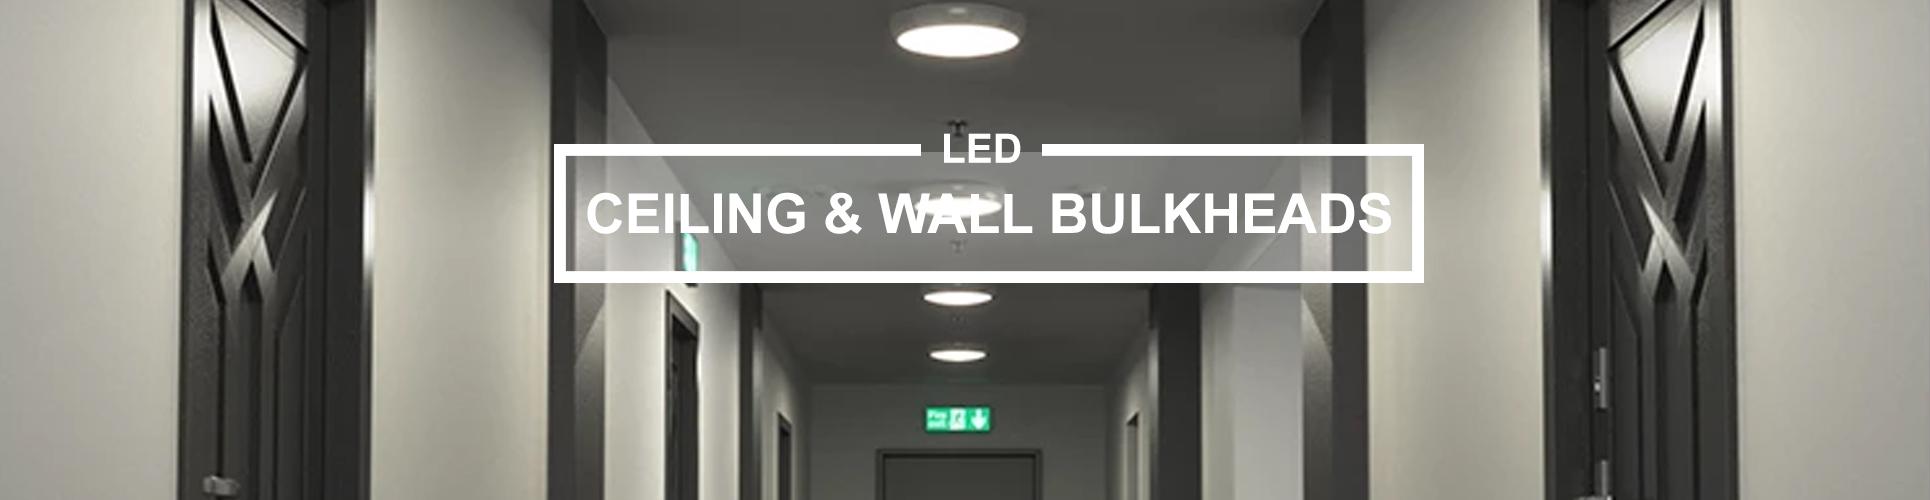 Ceiling & wall bulkheads